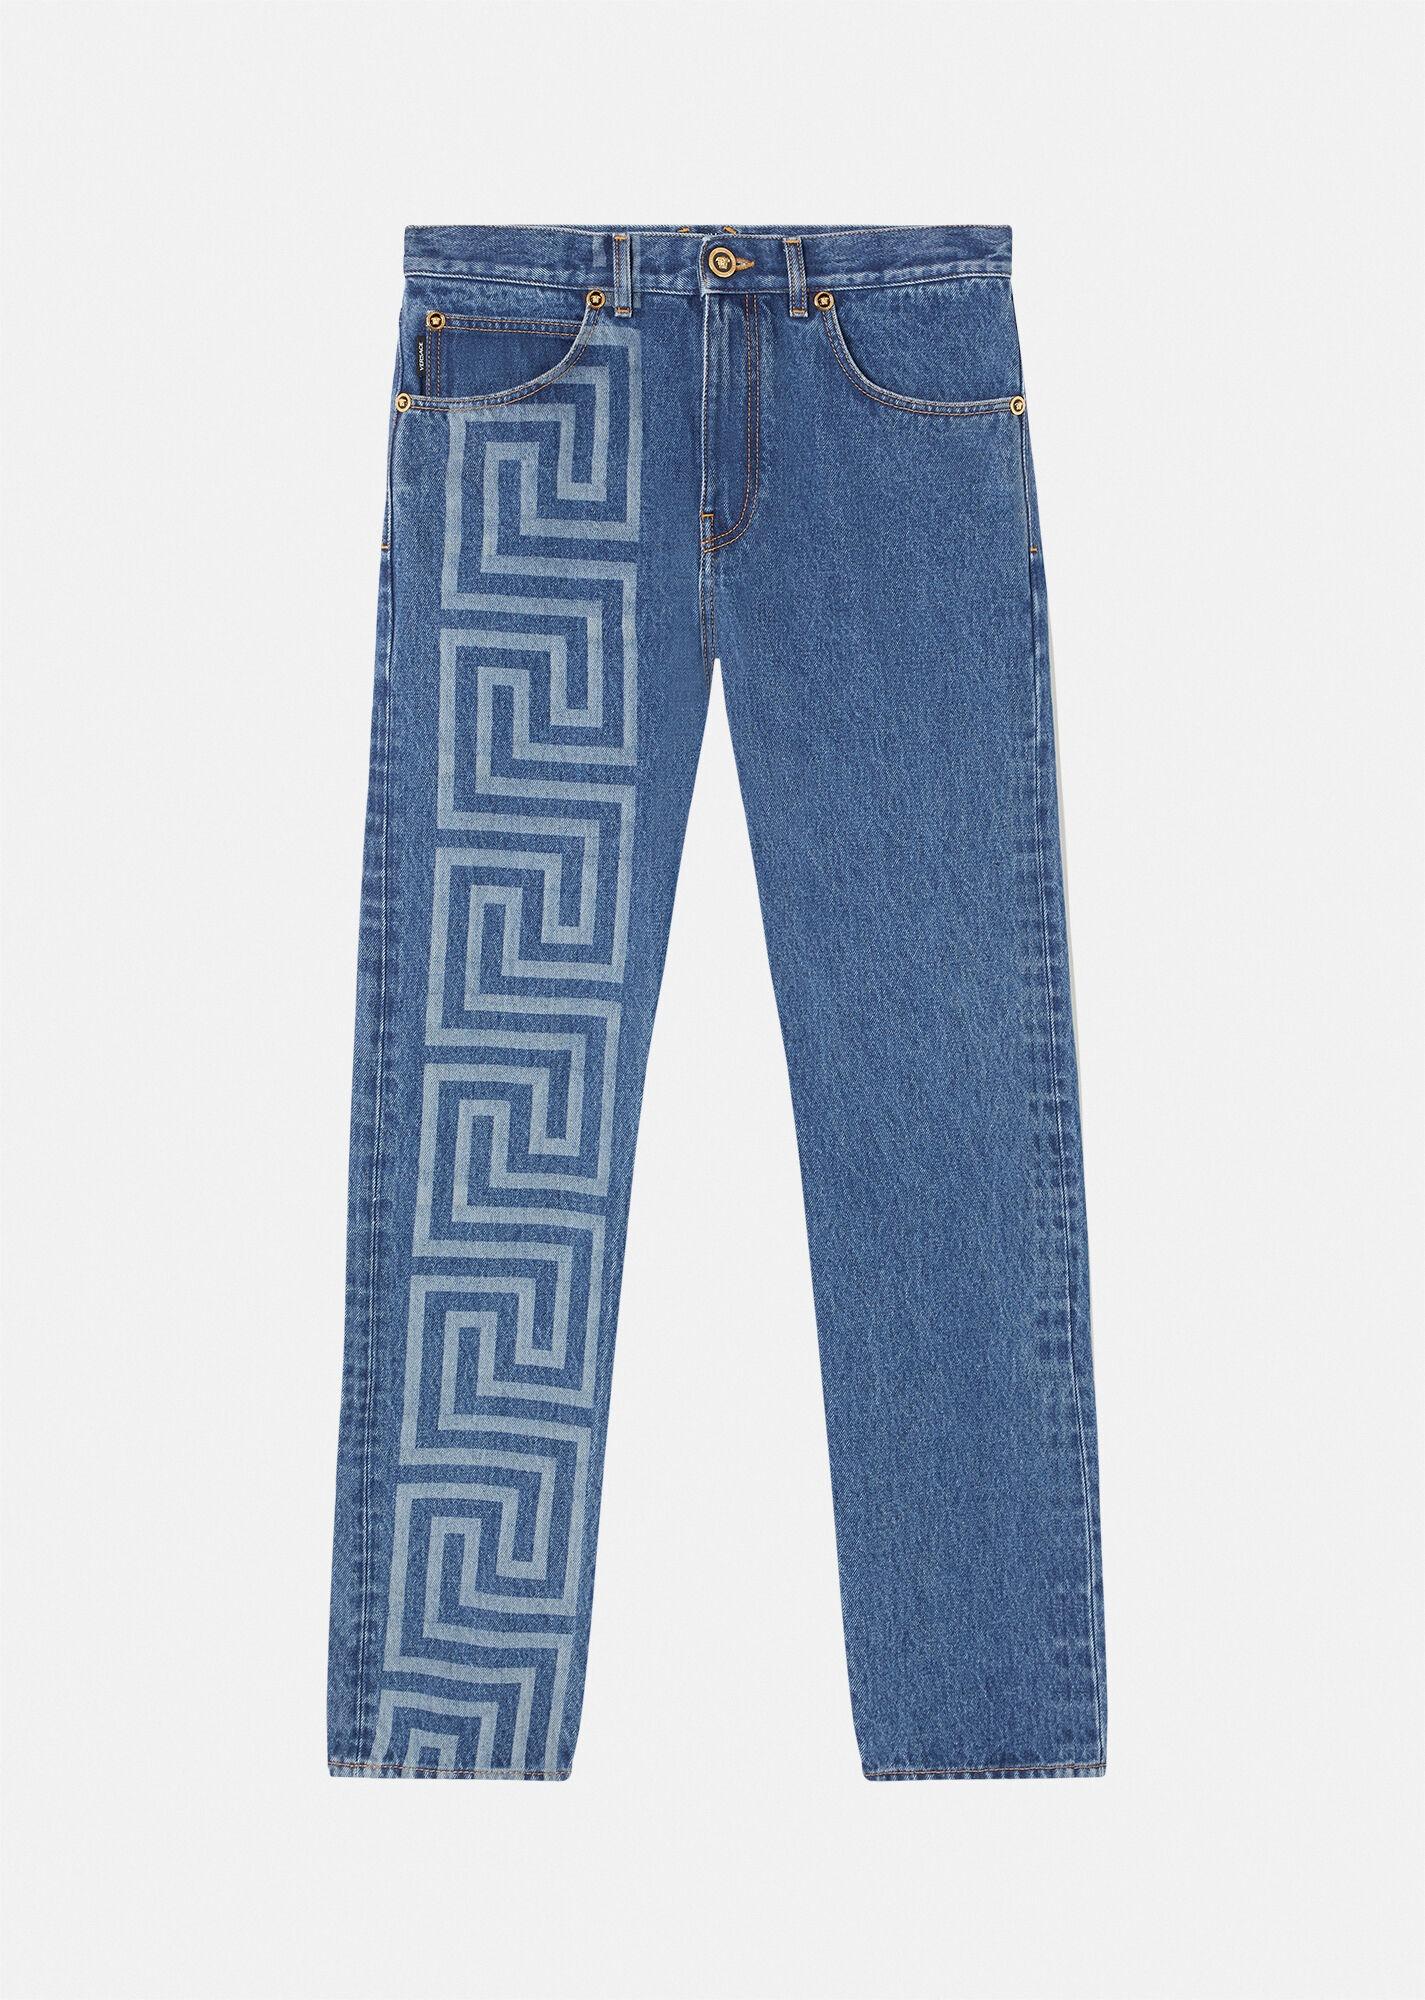 Versace Greca Jeans, designer jeans for men